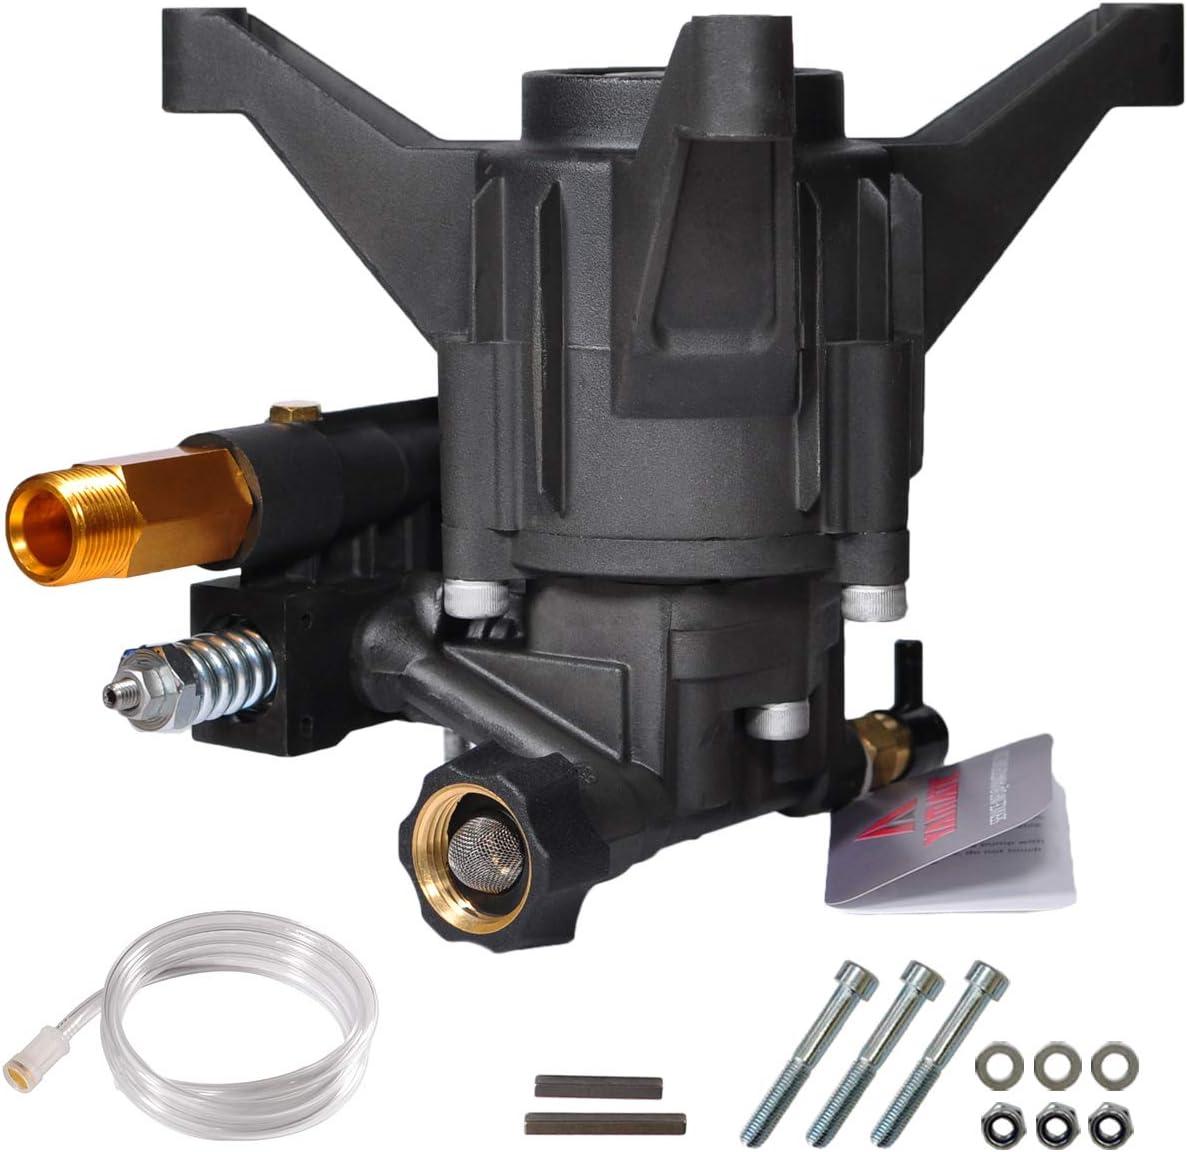 YAMATIC 2600-2800 PSI NEW Pressure Washer Pump Rear 発売モデル 送料無料 Outl GPM 2.3